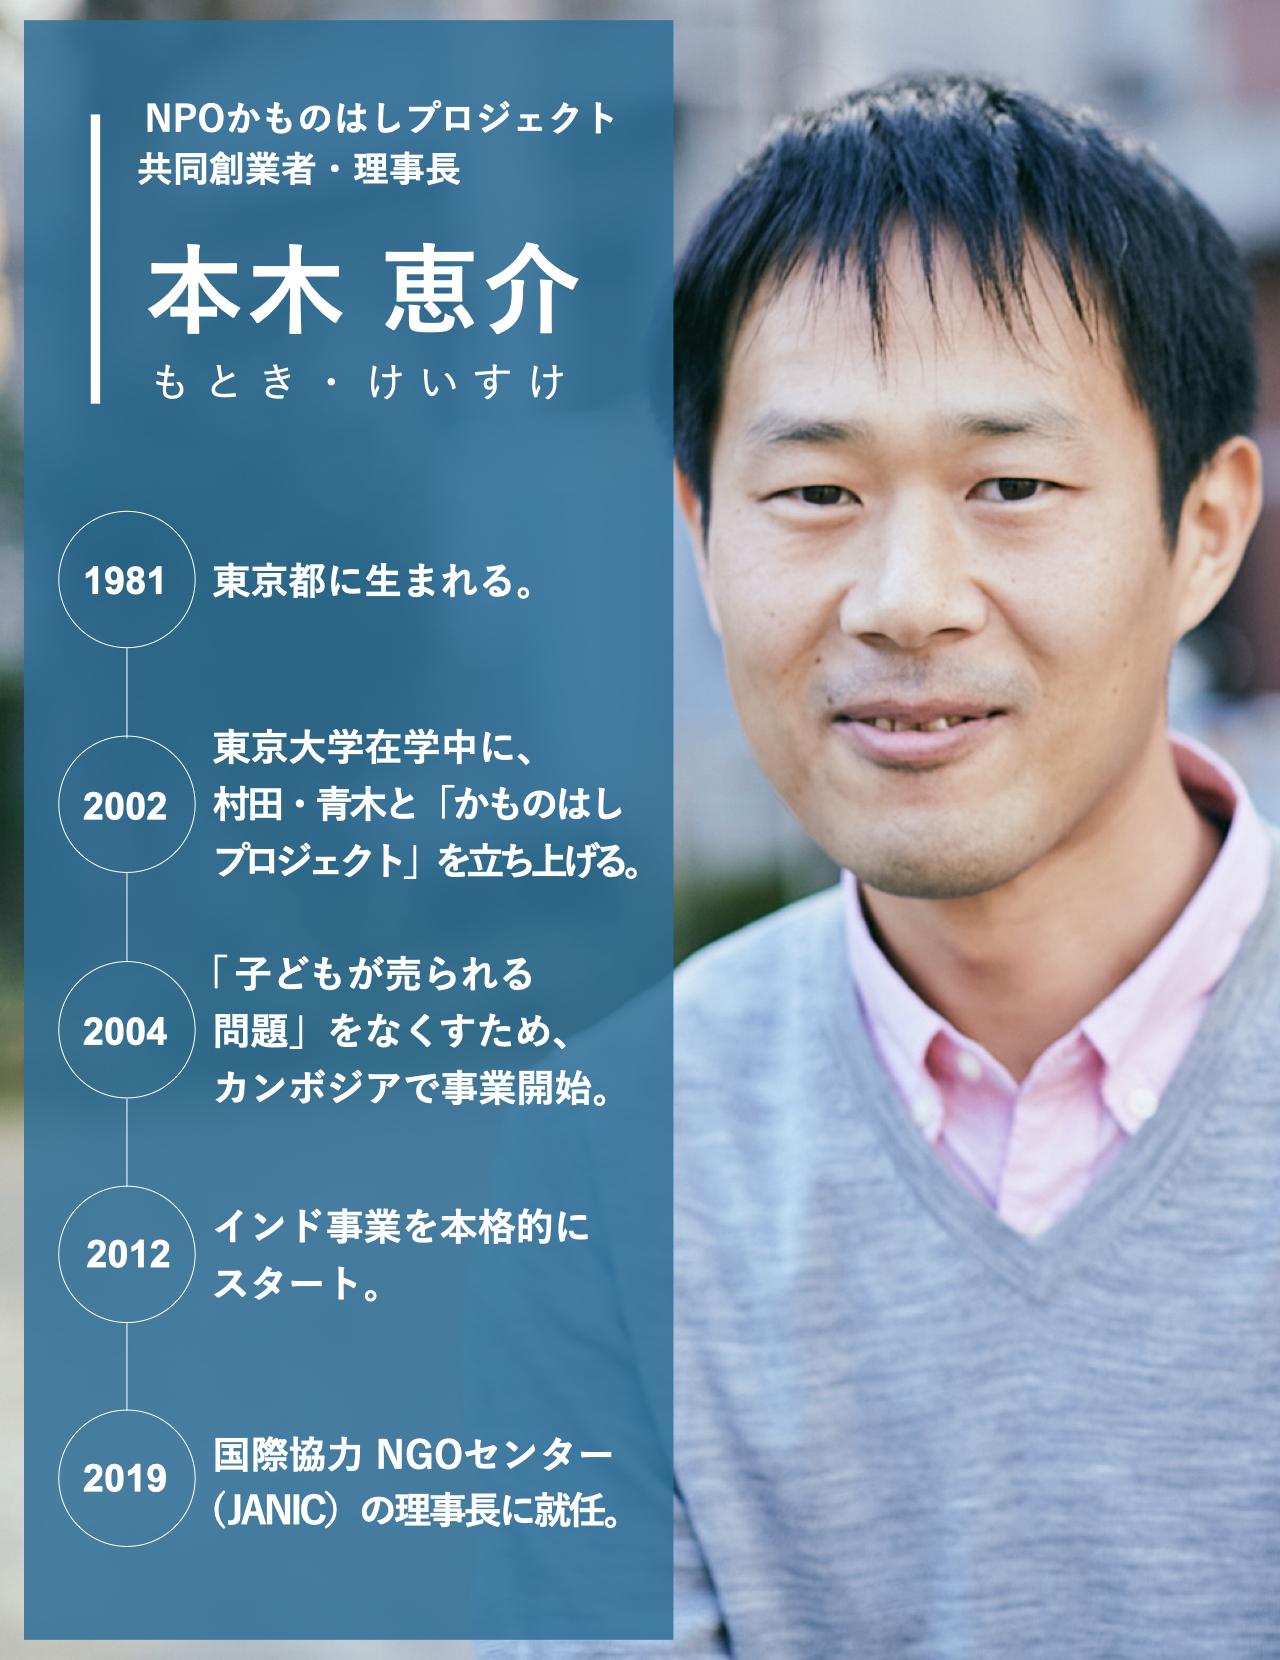 Motoko Keisuke